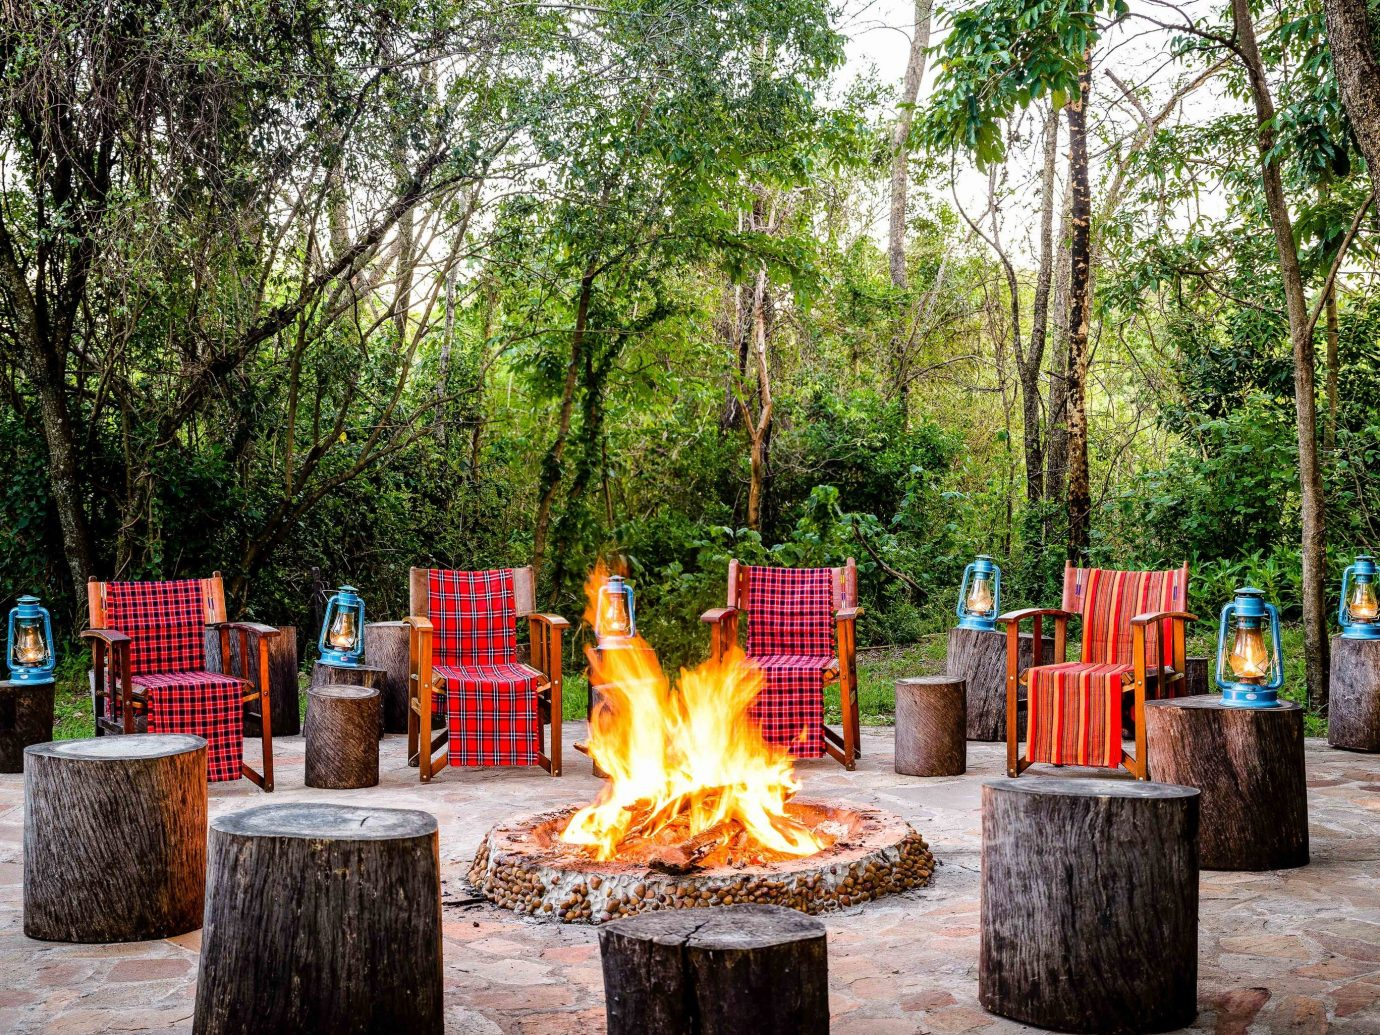 Beach Summer Travel Trip Ideas tree outdoor structure plant recreation leisure landscape backyard tourism